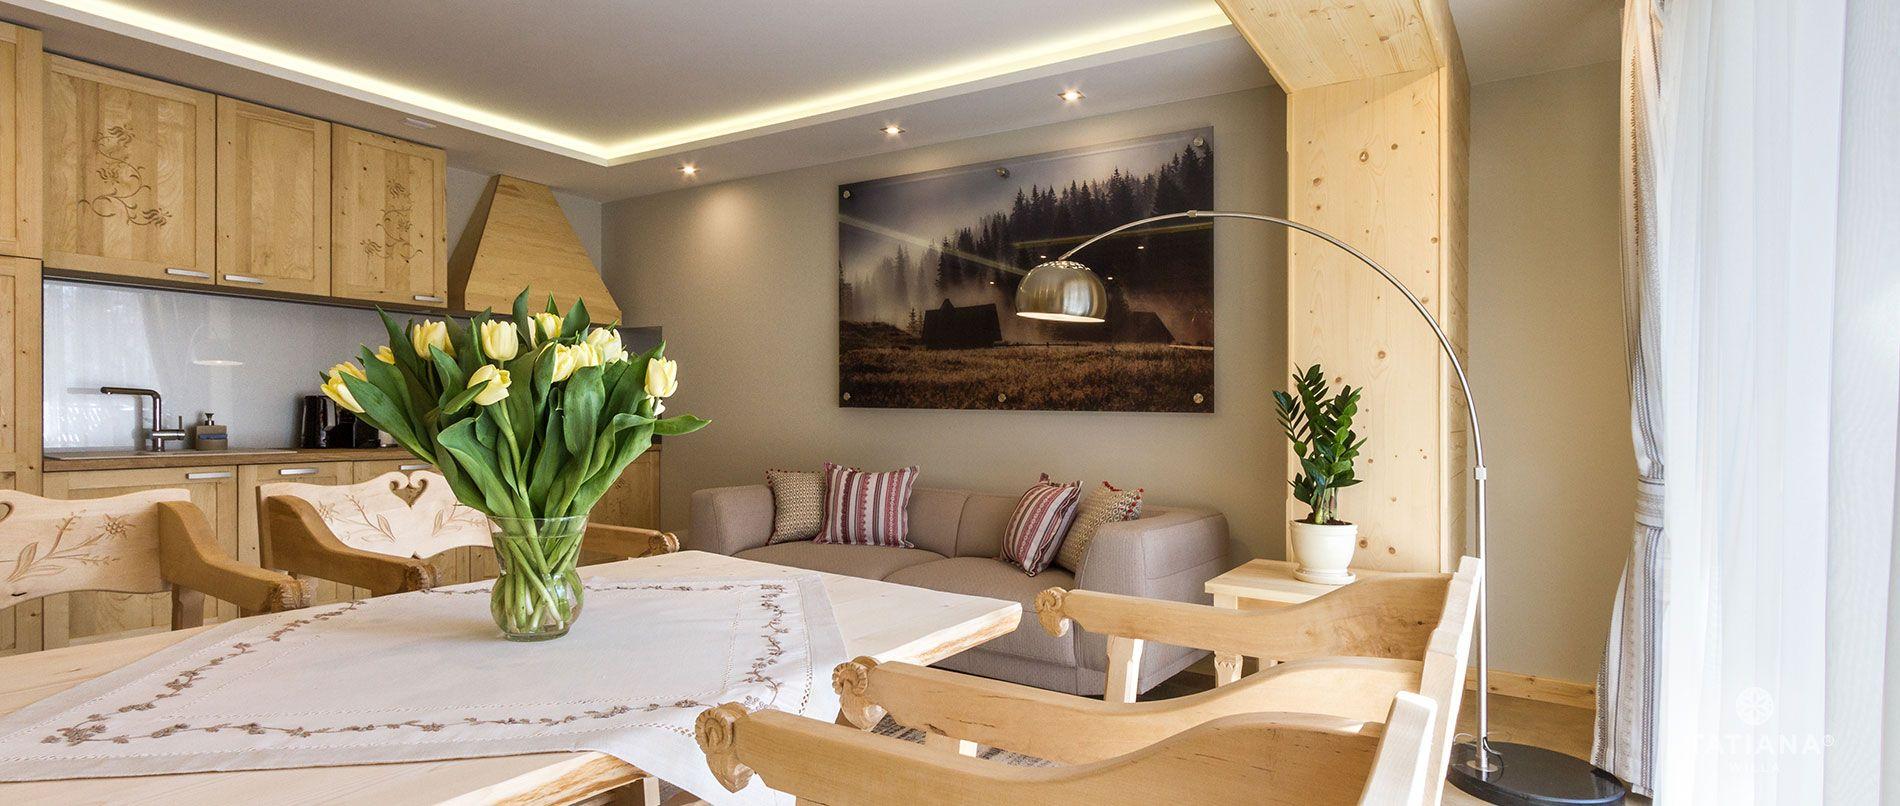 Apartament Sosnowy - jadalnia